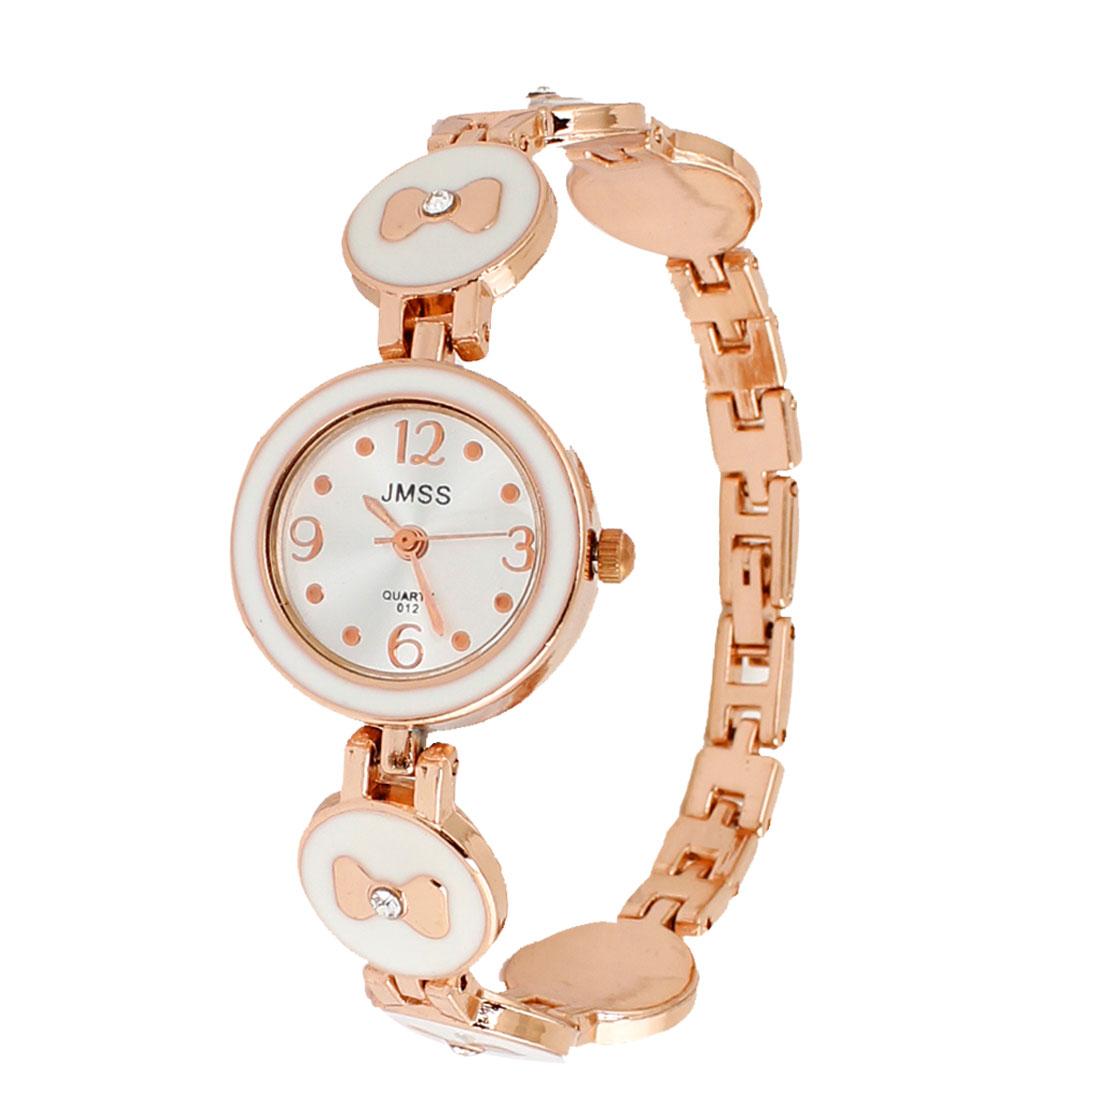 Copper Tone Ivory Bowknot Decor Round Dial Quartz Wrist Watch for Women